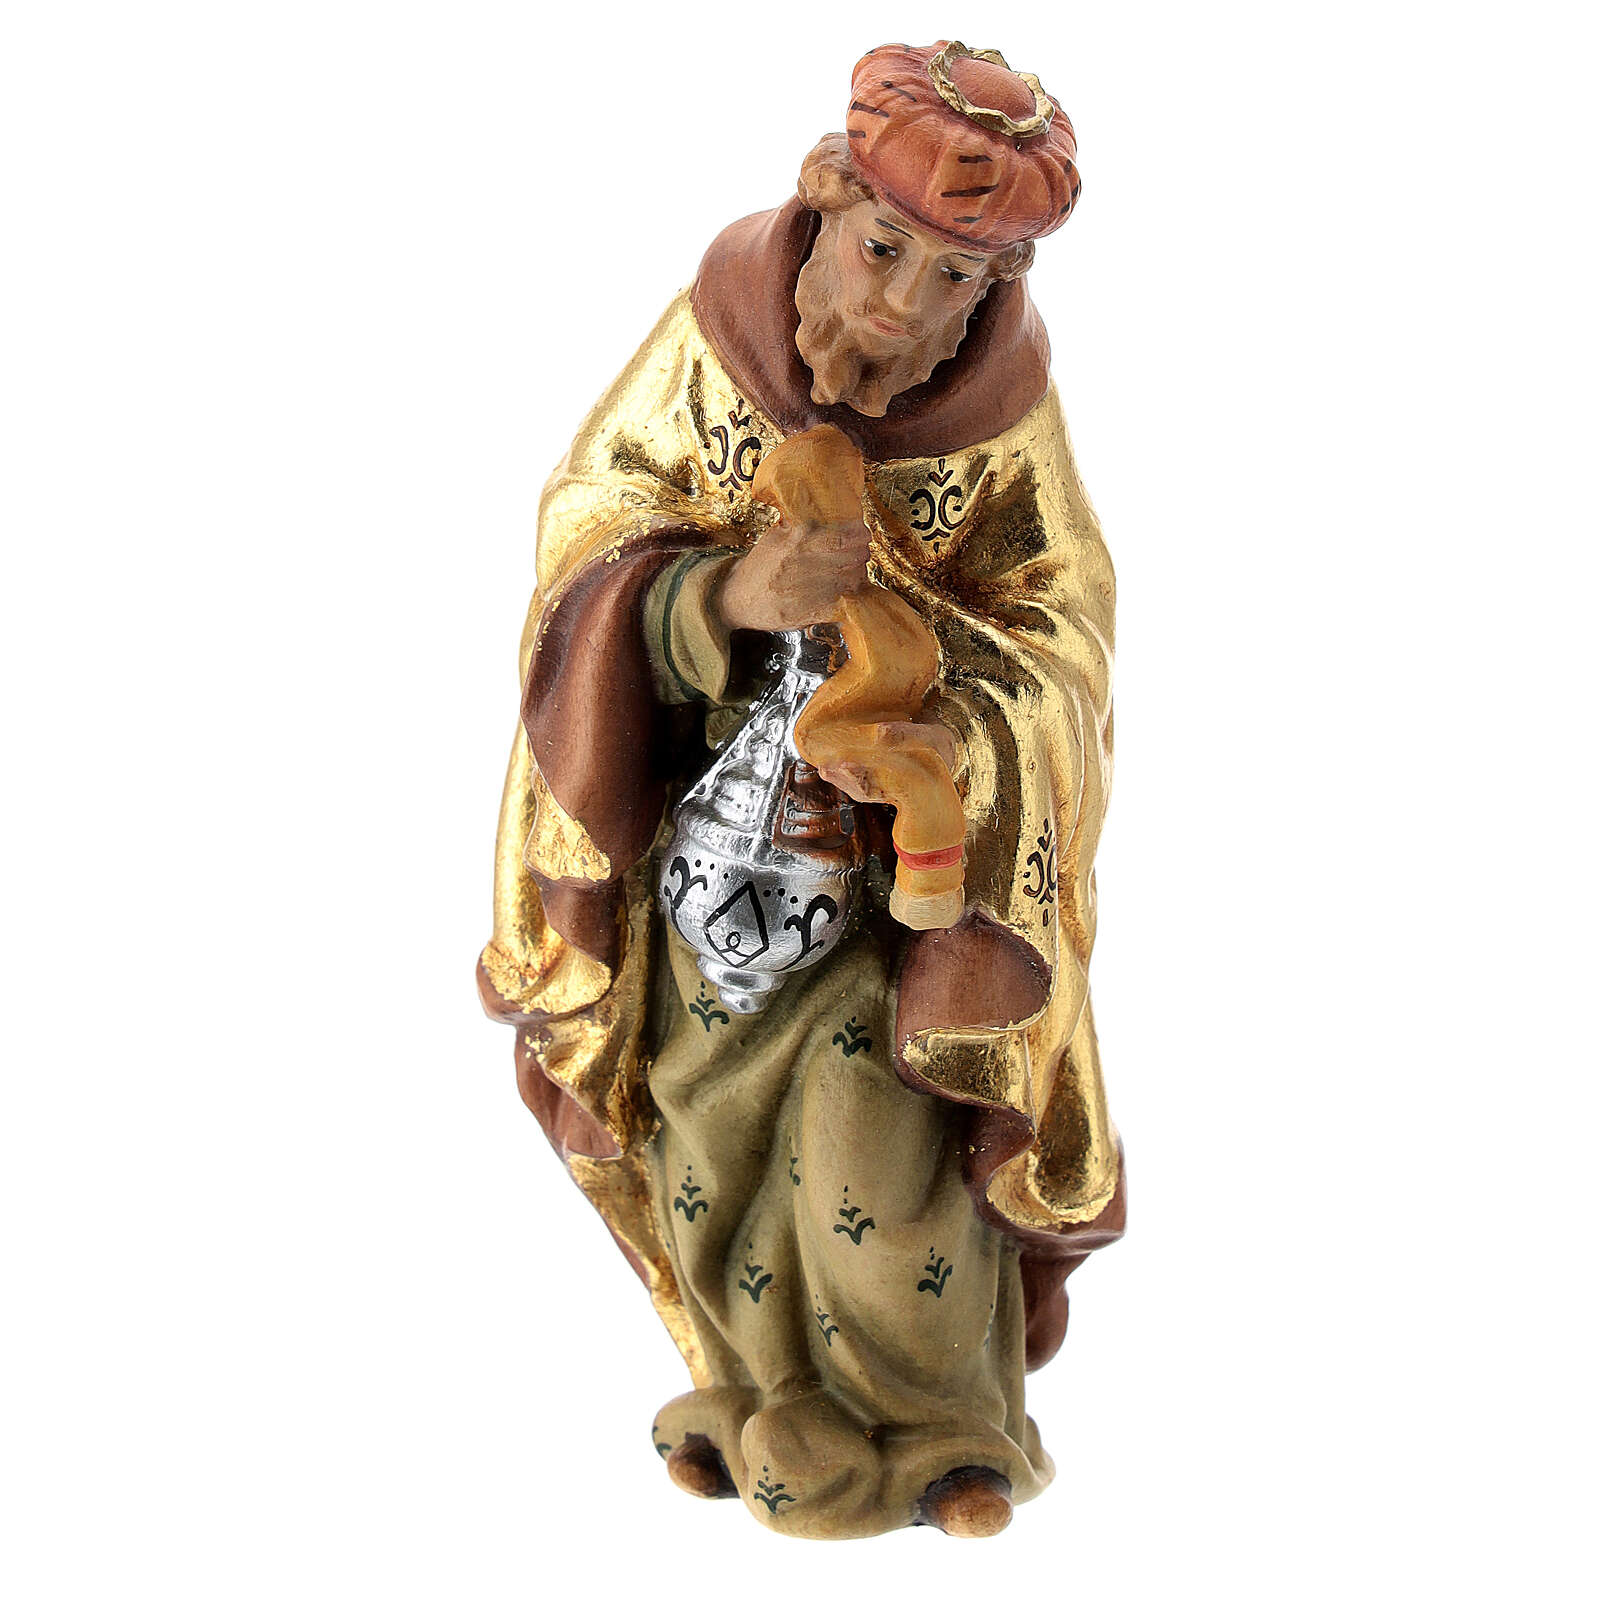 Re Magi presepe Matteo Val Gardena 12 cm legno 4